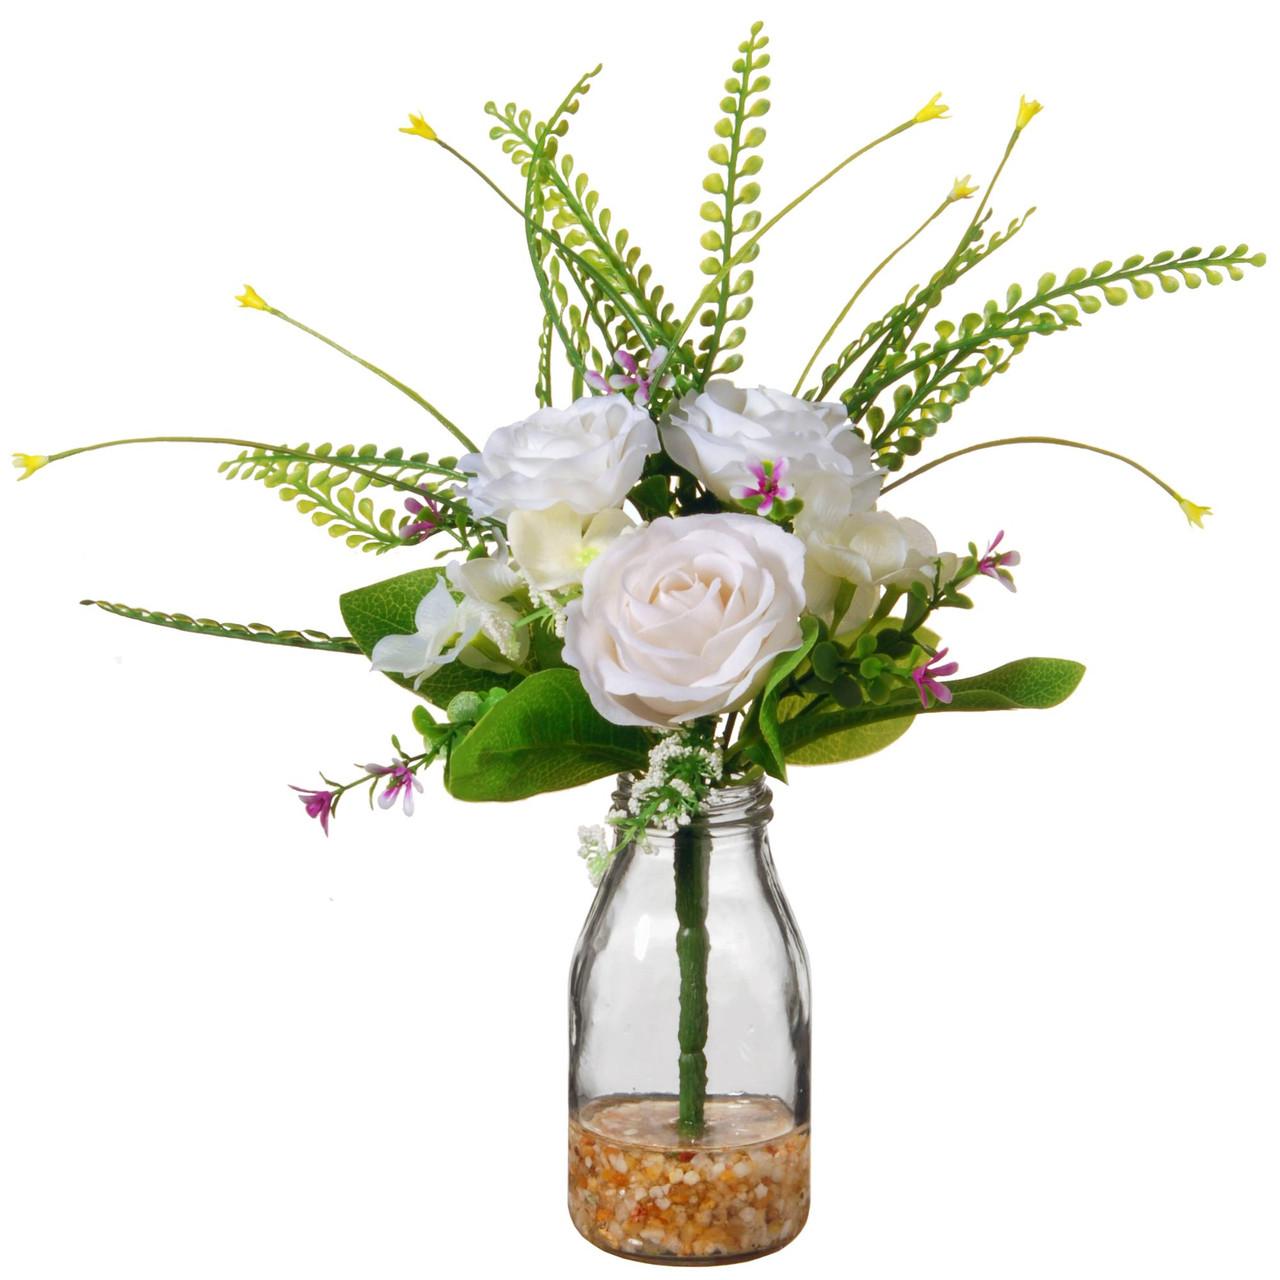 12 Artificial White Rose Flower Arrangement In Glass Vase Christmas Central